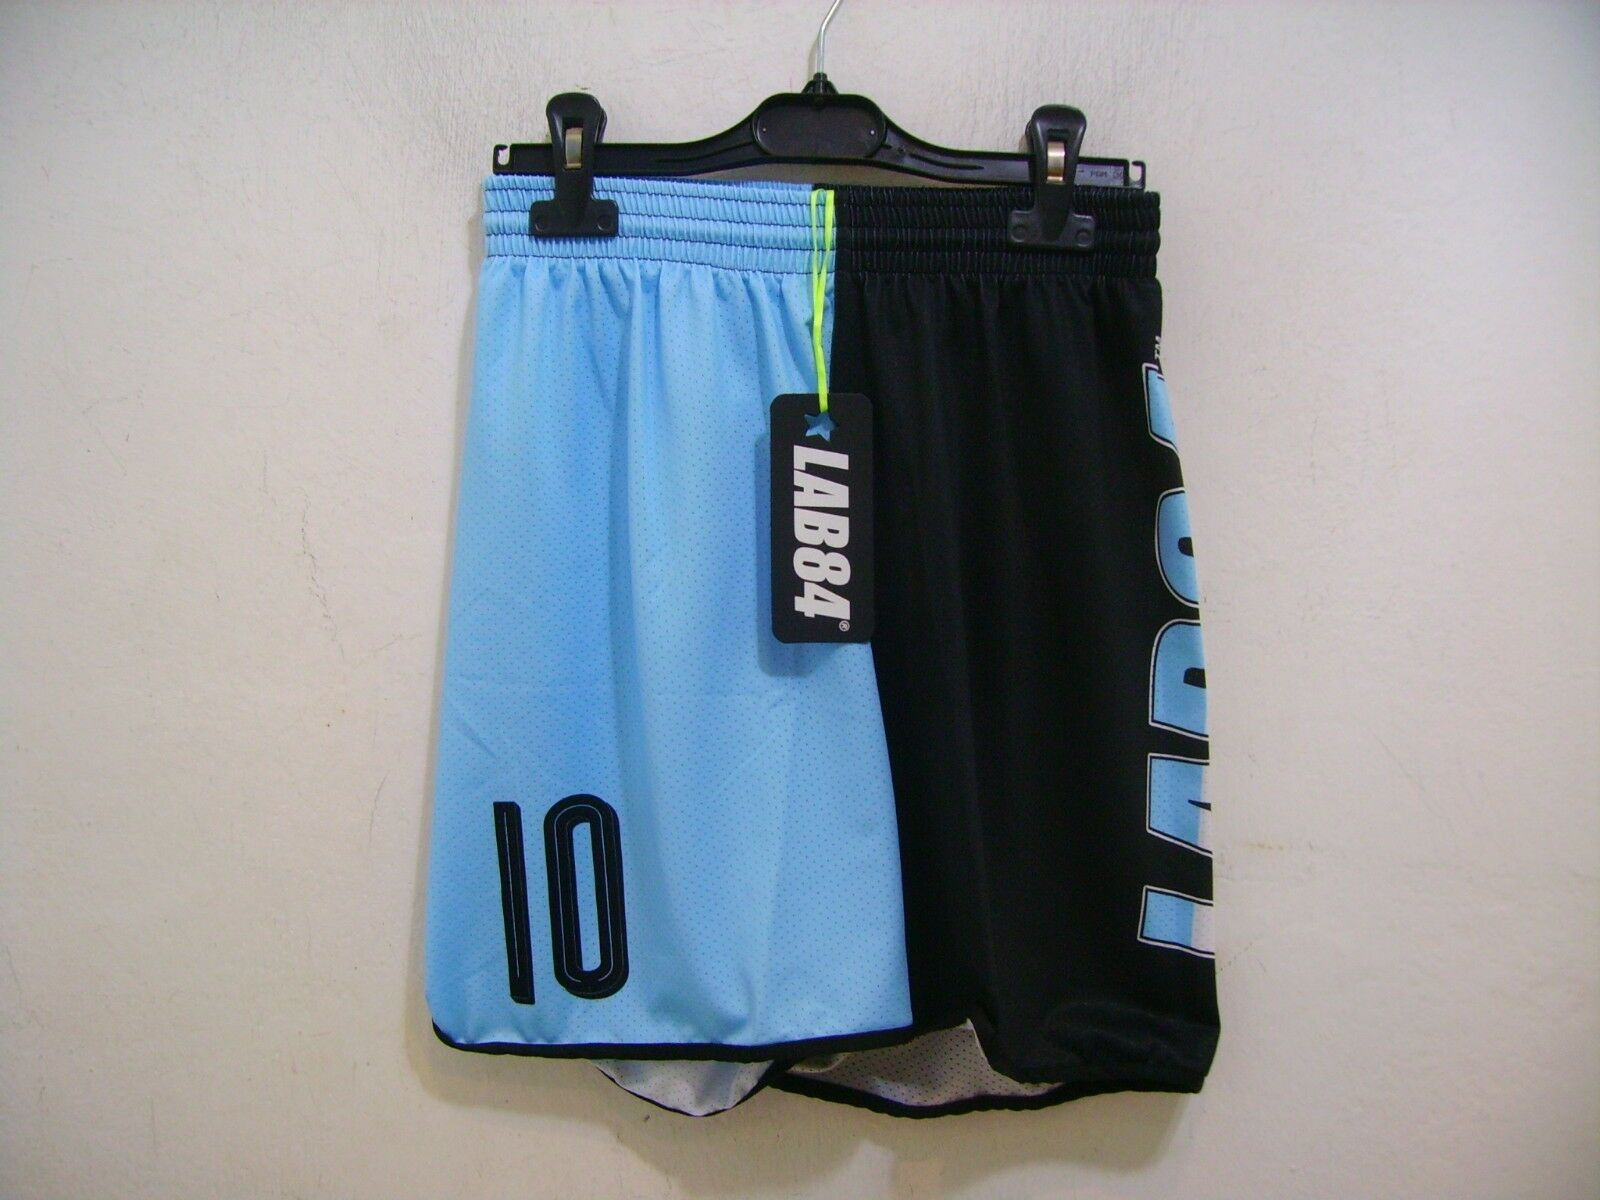 Lab84 Costume Pantaloncino Dryfit SHTU1008FLAG silverina black Azzurro